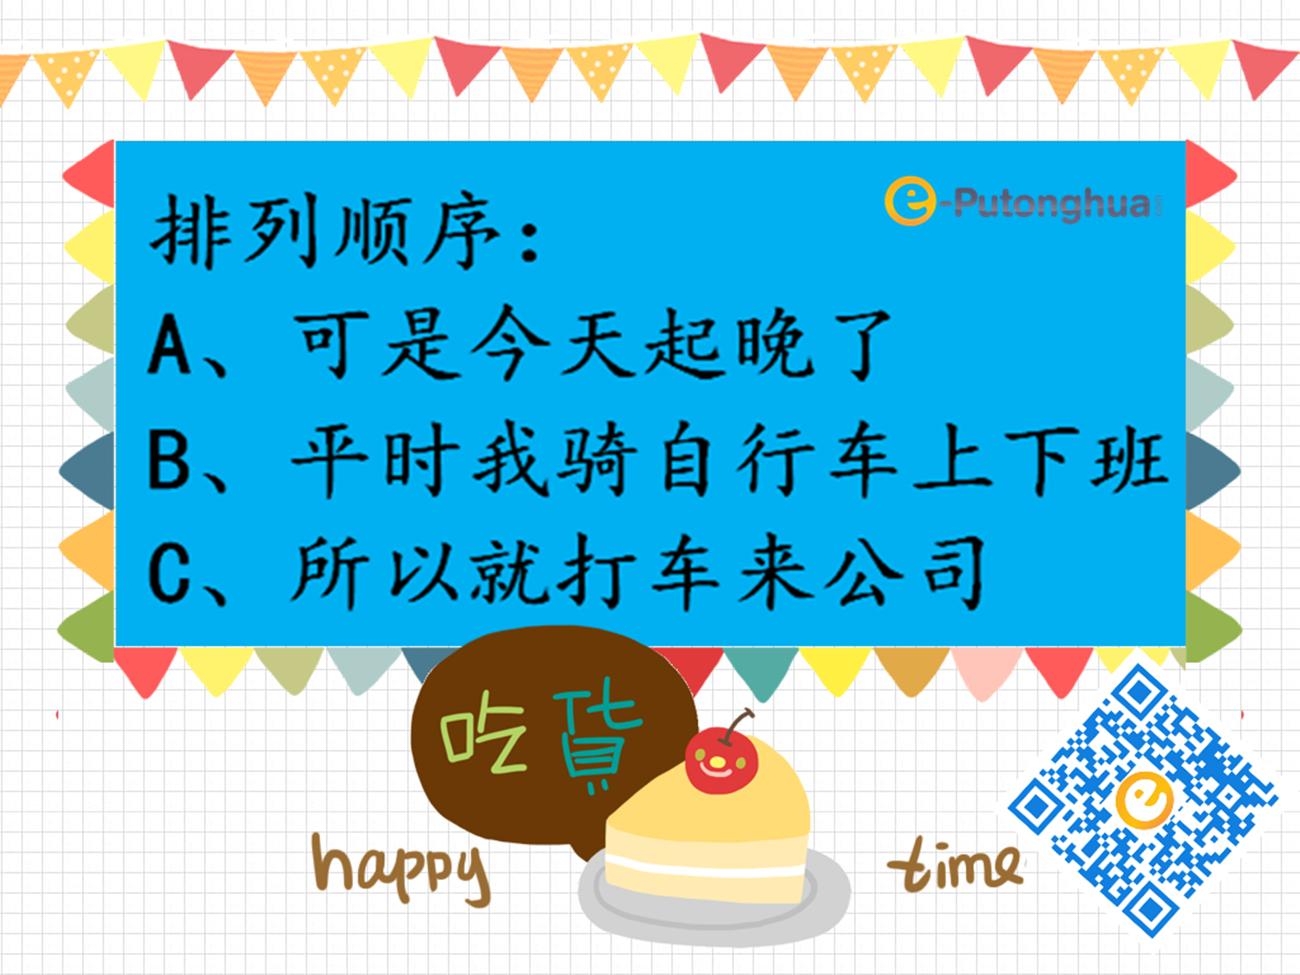 Learn Putonghua - 可是今天起晚了。( Kěshì jīntiān qǐ wǎnle. ) - www.e-Putonghua.com